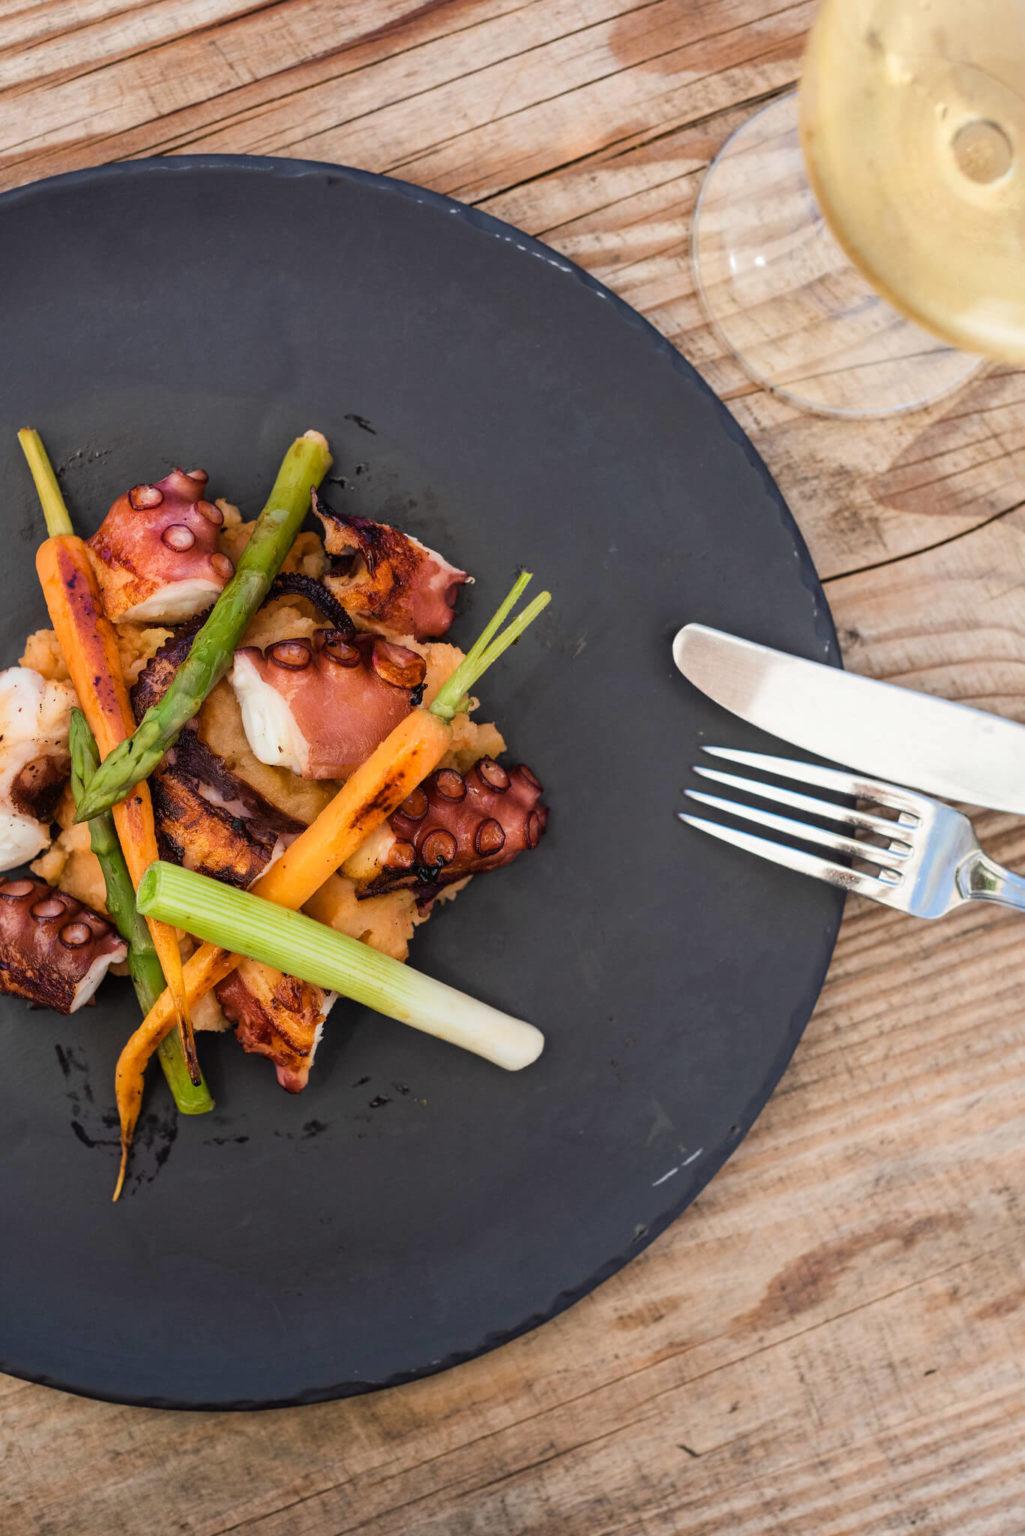 https://www.white-ibiza.com/wp-content/uploads/2020/03/white-ibiza-restaurants-es-cucons-11-1025x1536.jpg